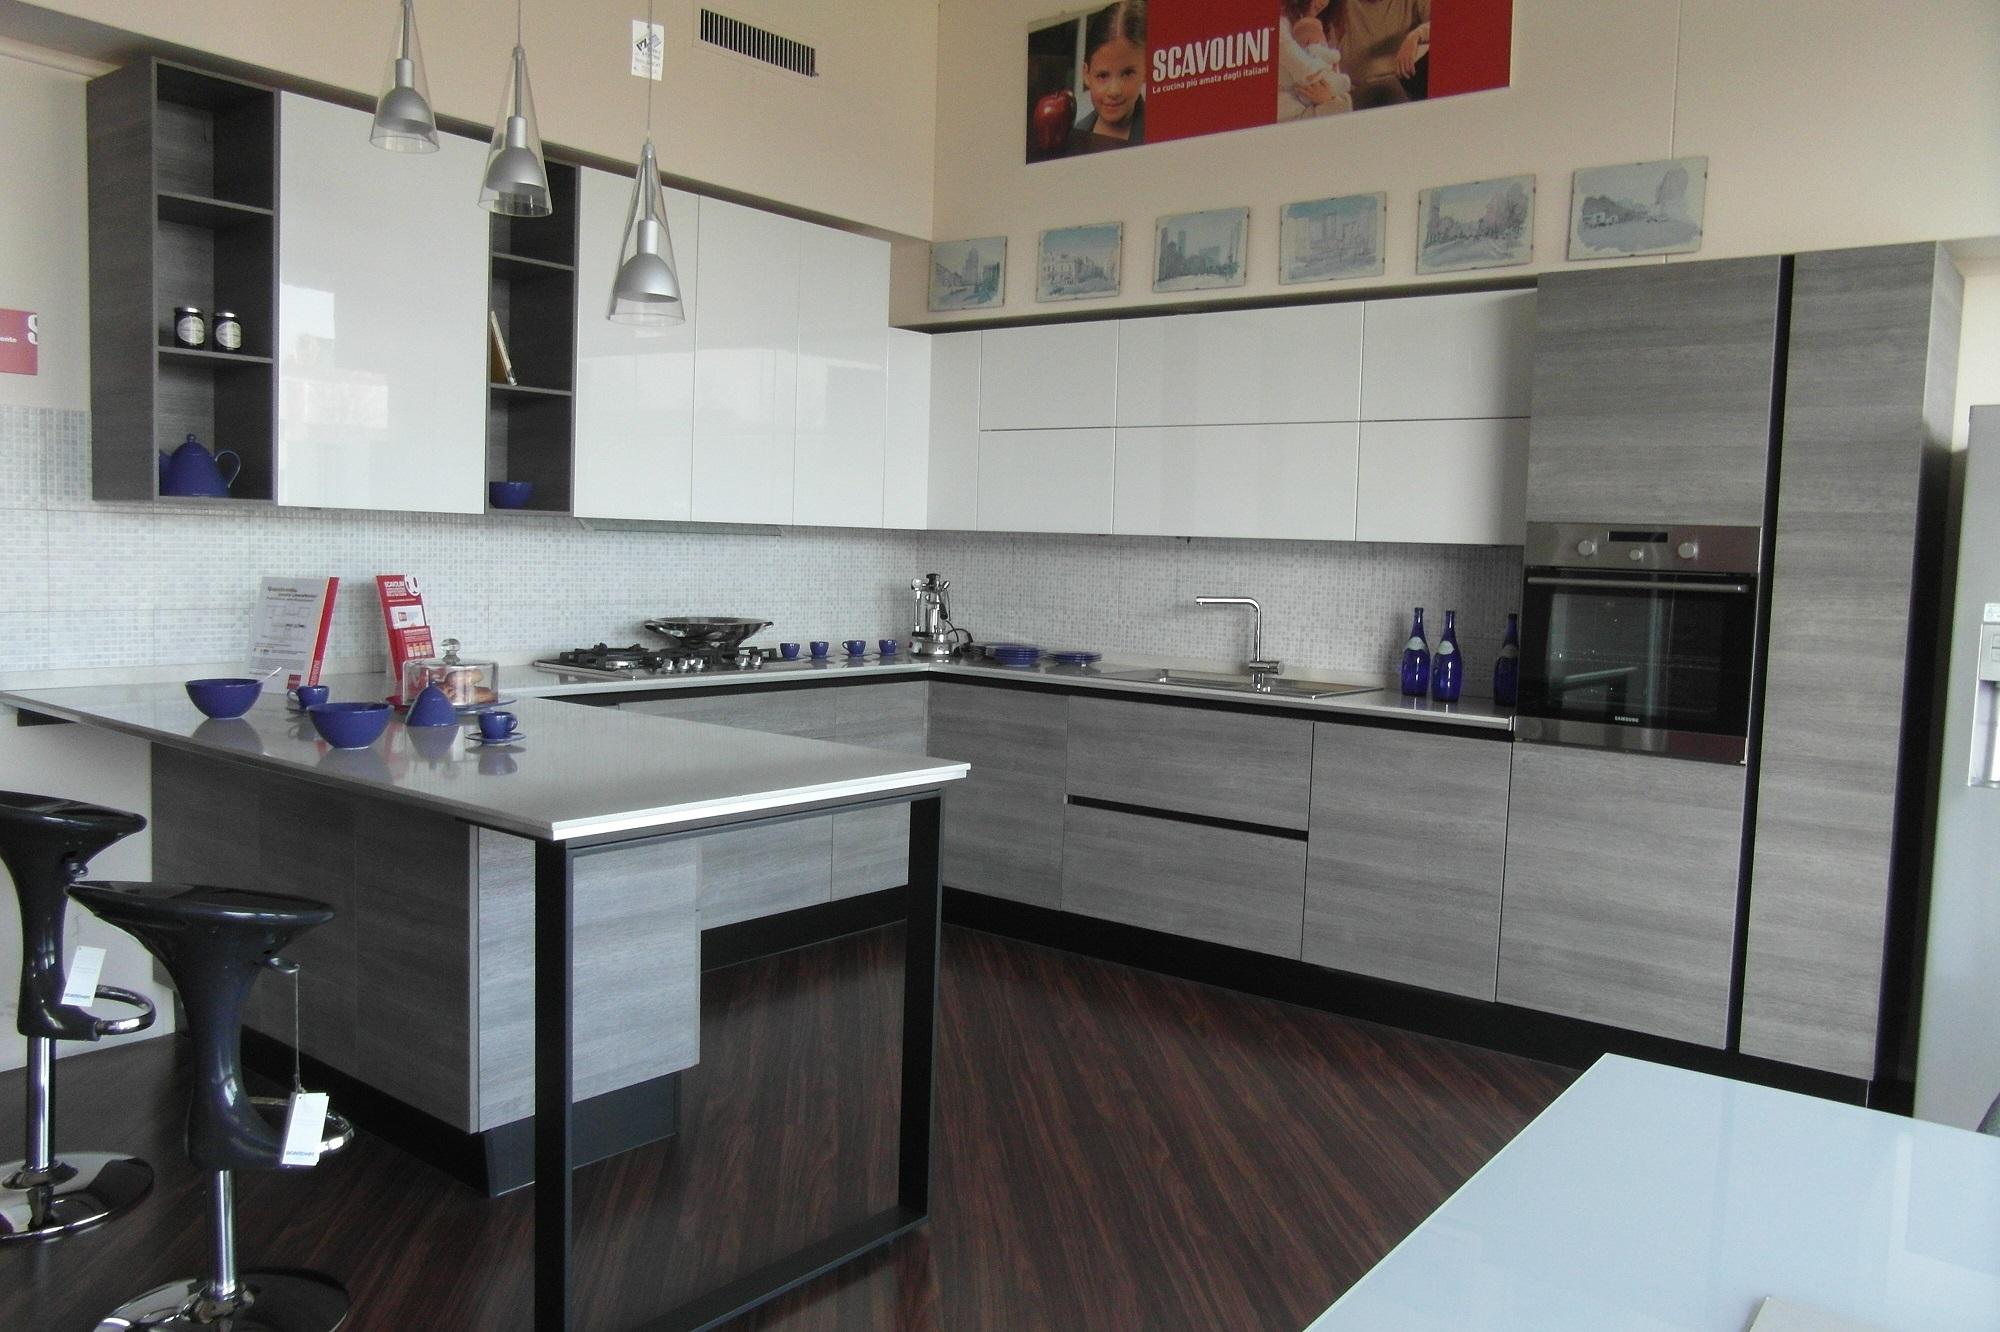 maniglie cucina scavolini - 28 images - best maniglie cucina ...